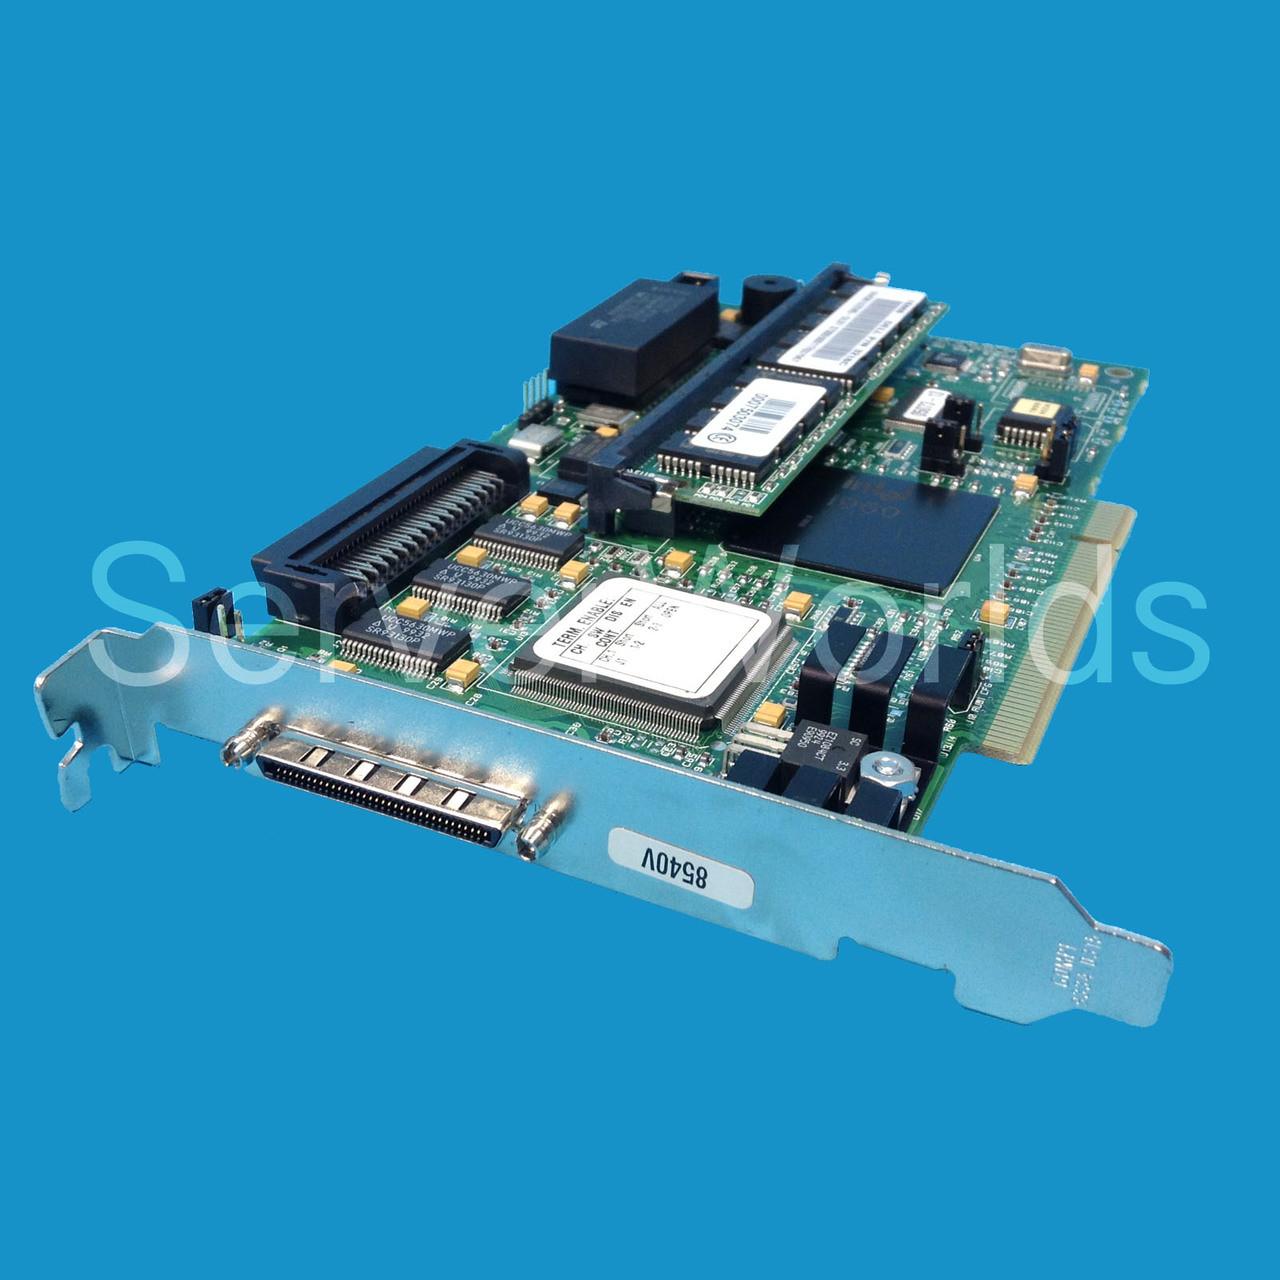 Dell 8540V   Perc 2 Raid Controller - Serverworlds